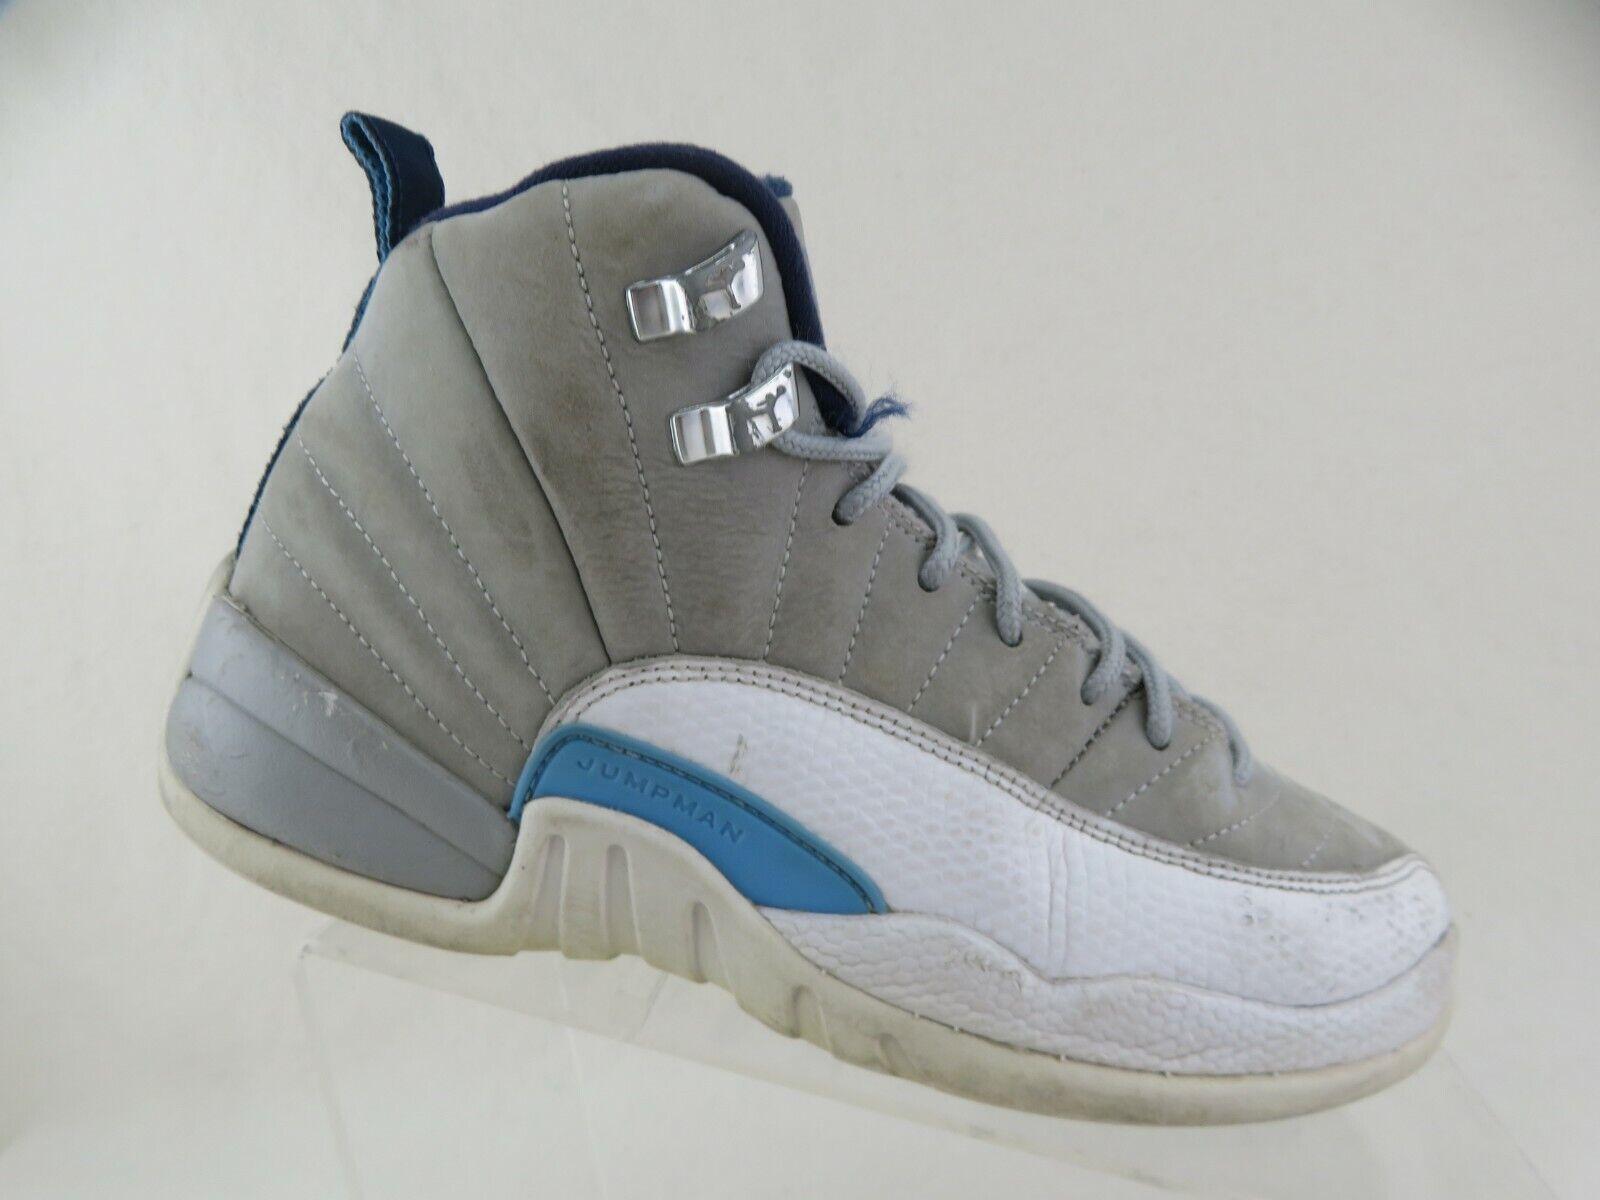 NIKE Air Jordan 12 XII University Blue Sz 5y Kids Basketball Shoes